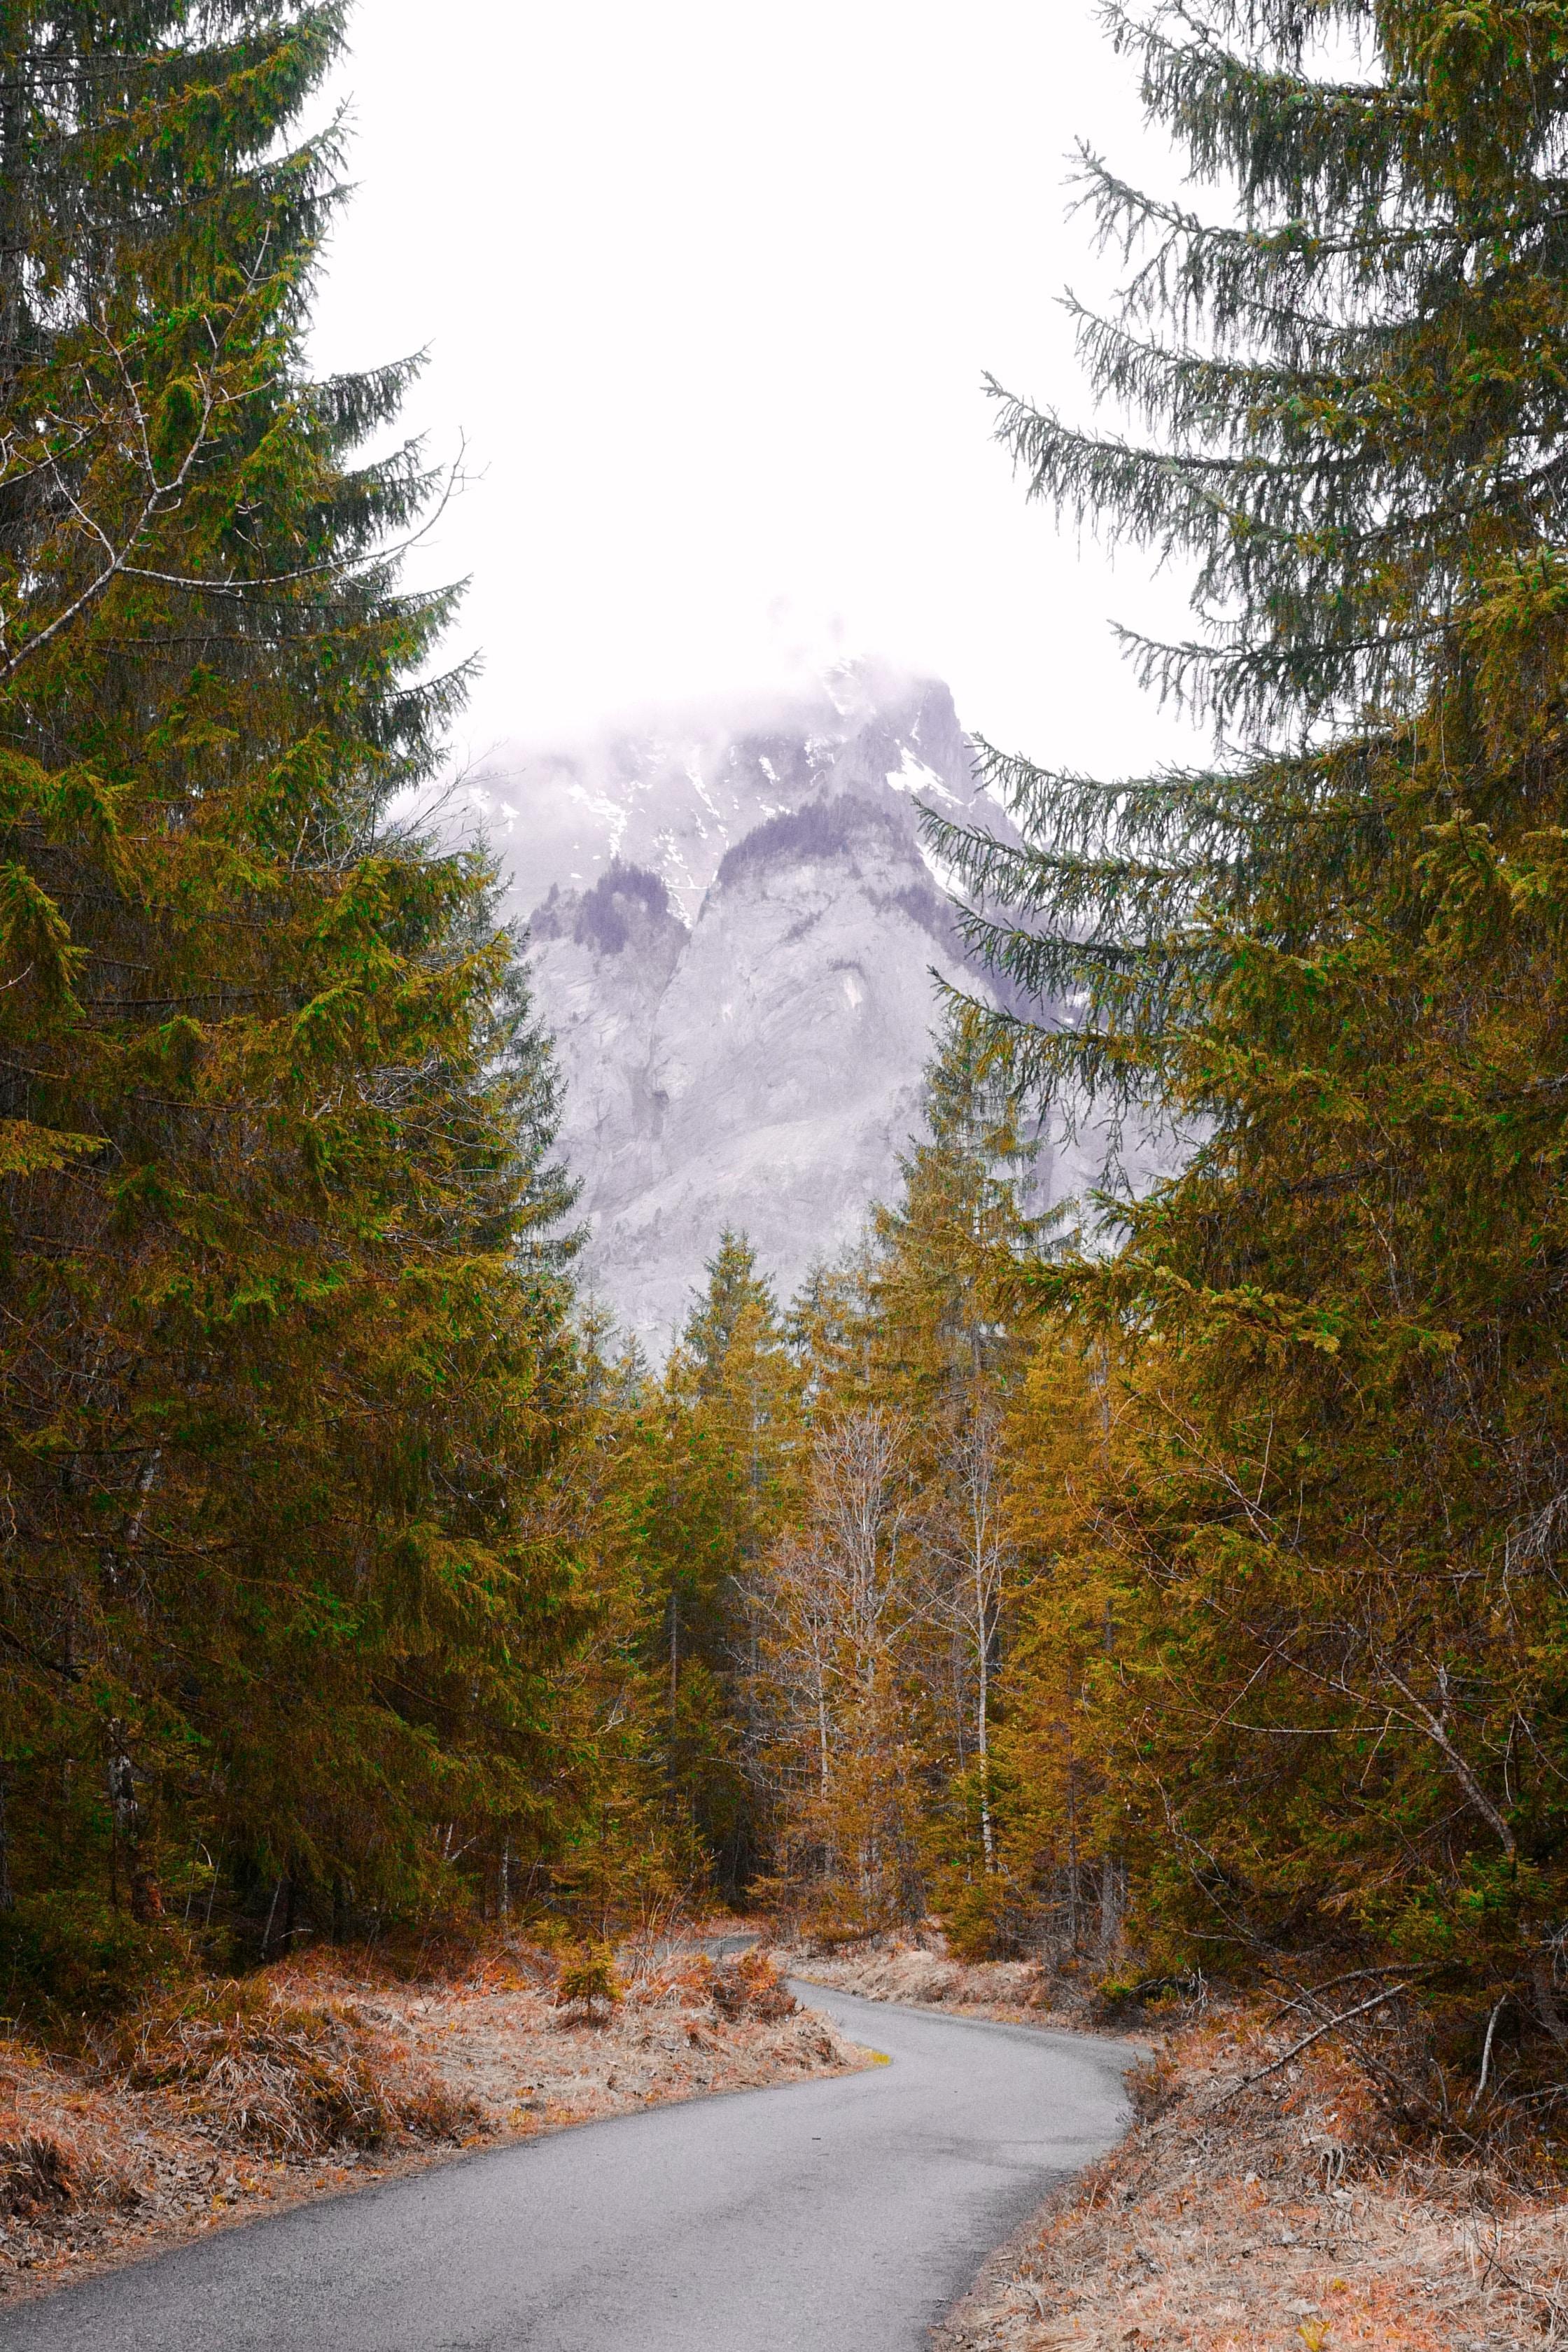 empty road between trees near mountain